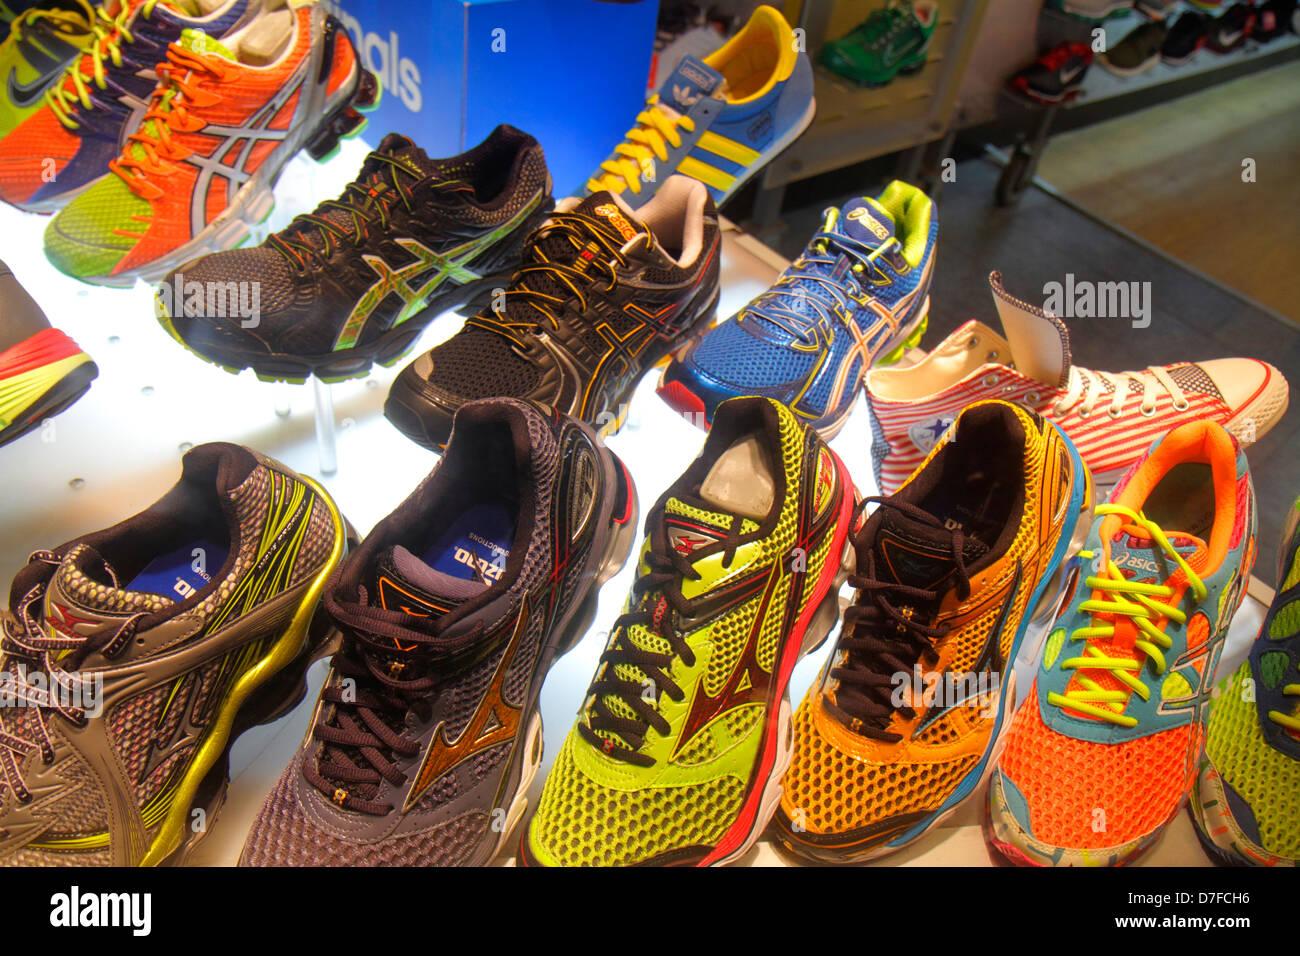 reebok sur chaussures reebok pieton pieton chaussures reebok chaussures sur sur R5L3jA4